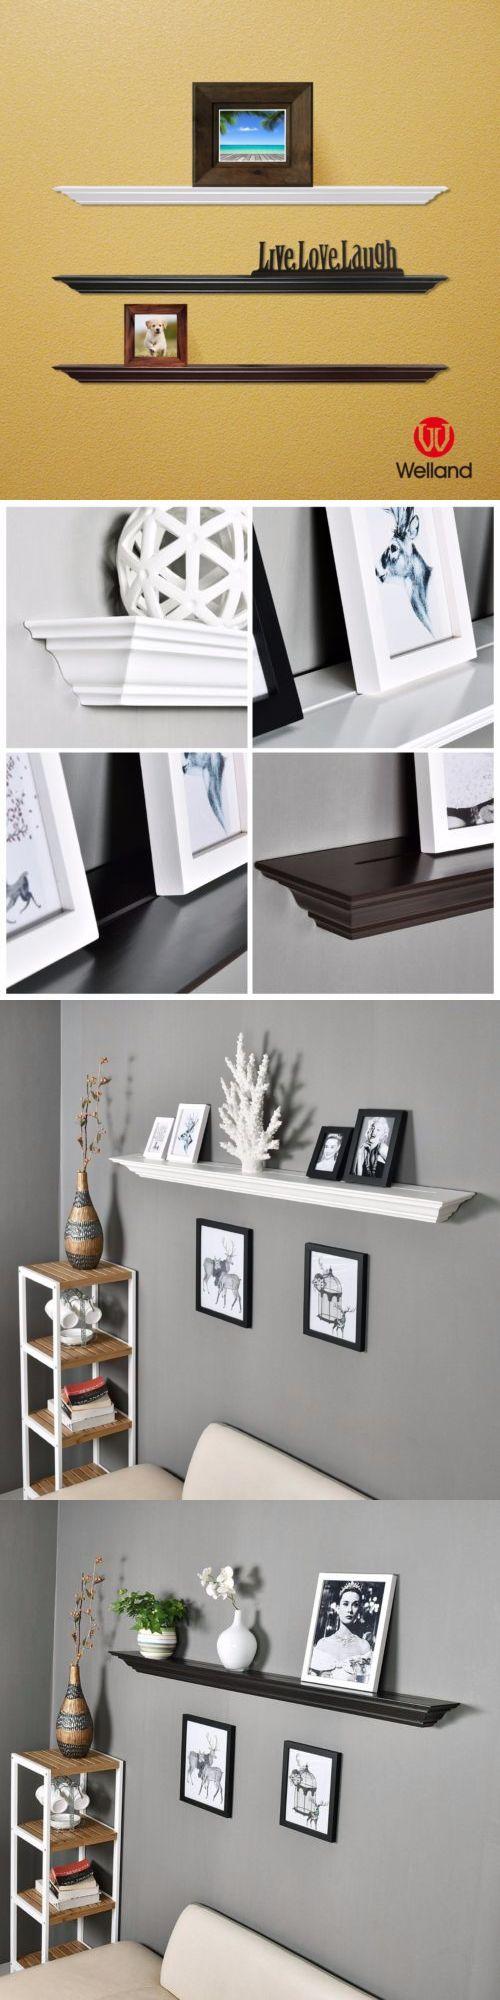 Wall Shelves 45501: Welland 60 Corona Crown Molding Floating Ledge Painted Wood Wall Shelf Shelves -> BUY IT NOW ONLY: $75.5 on eBay!